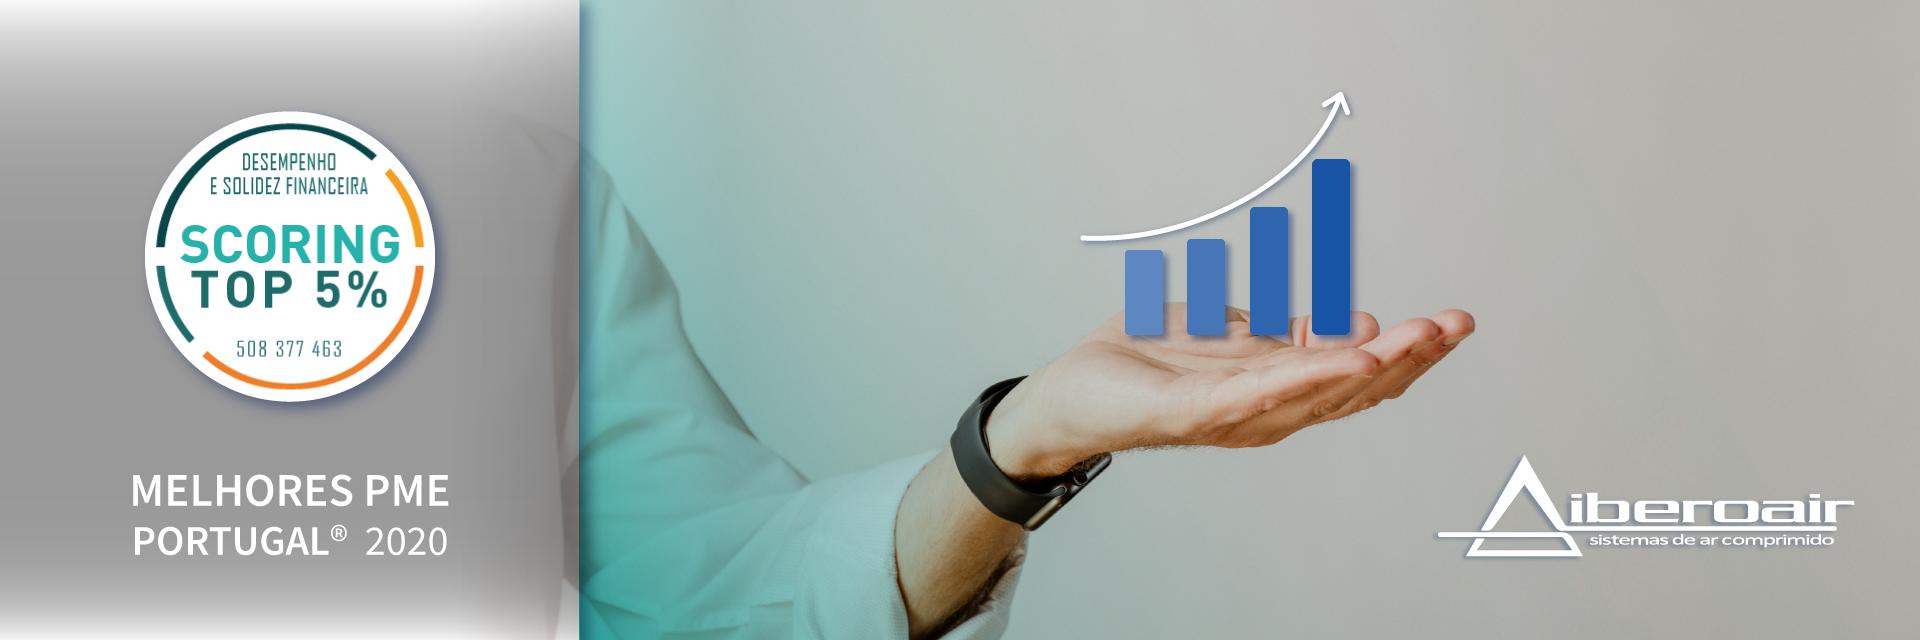 Iberoair Top 5% Melhores PME 2020